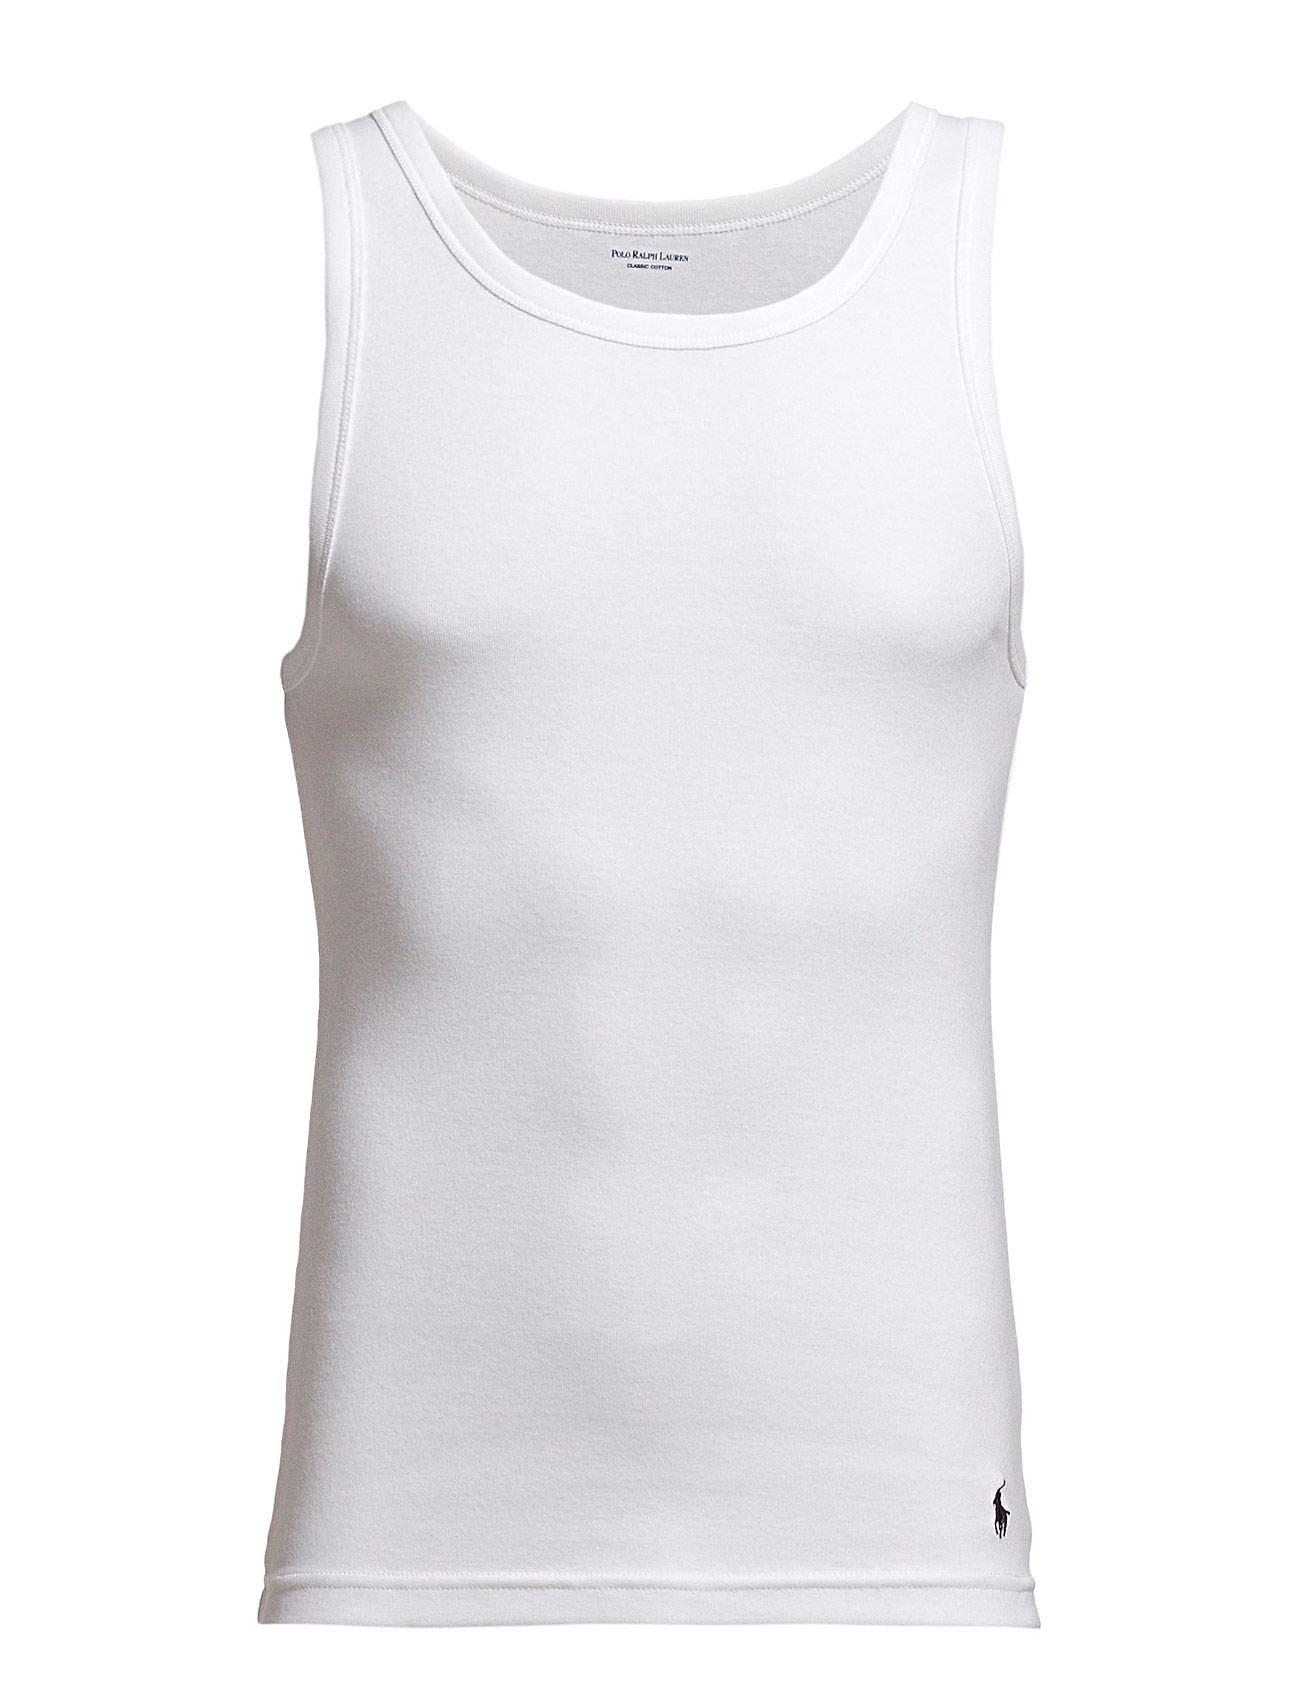 Polo Ralph Lauren Underwear 2 PACKS CLASSIC TANKS - WHITE